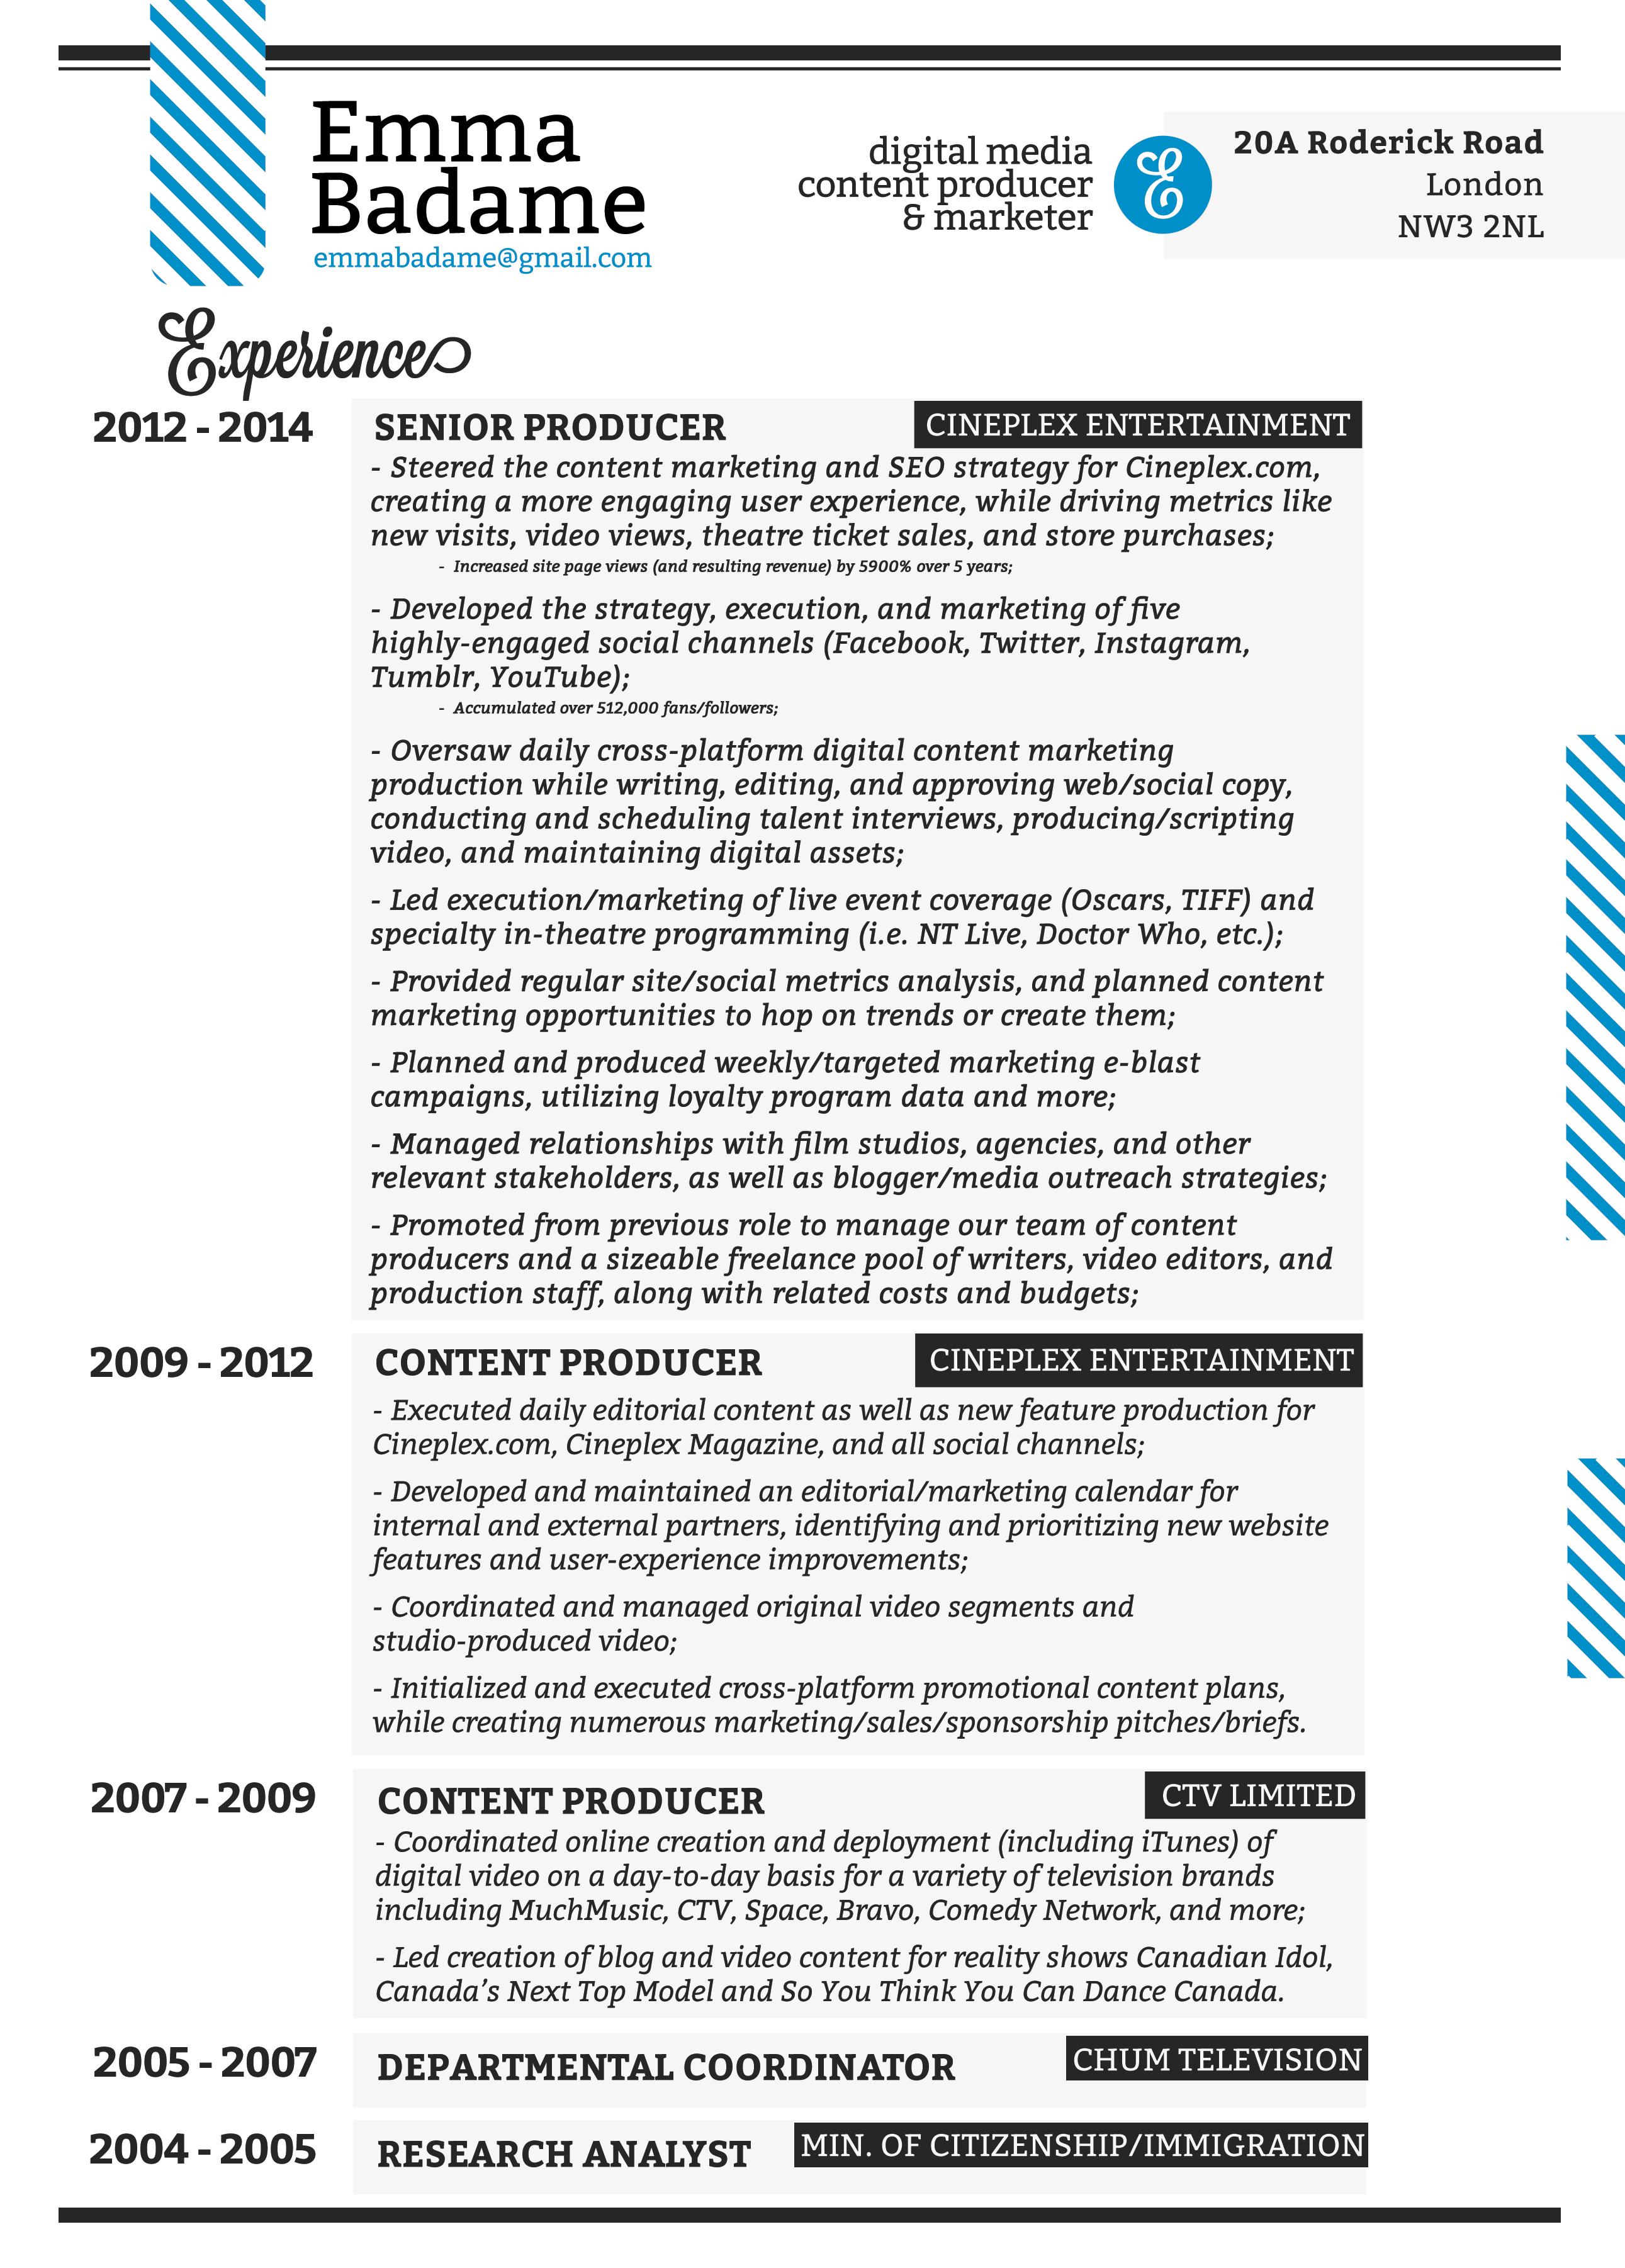 Resume | Emma Badame